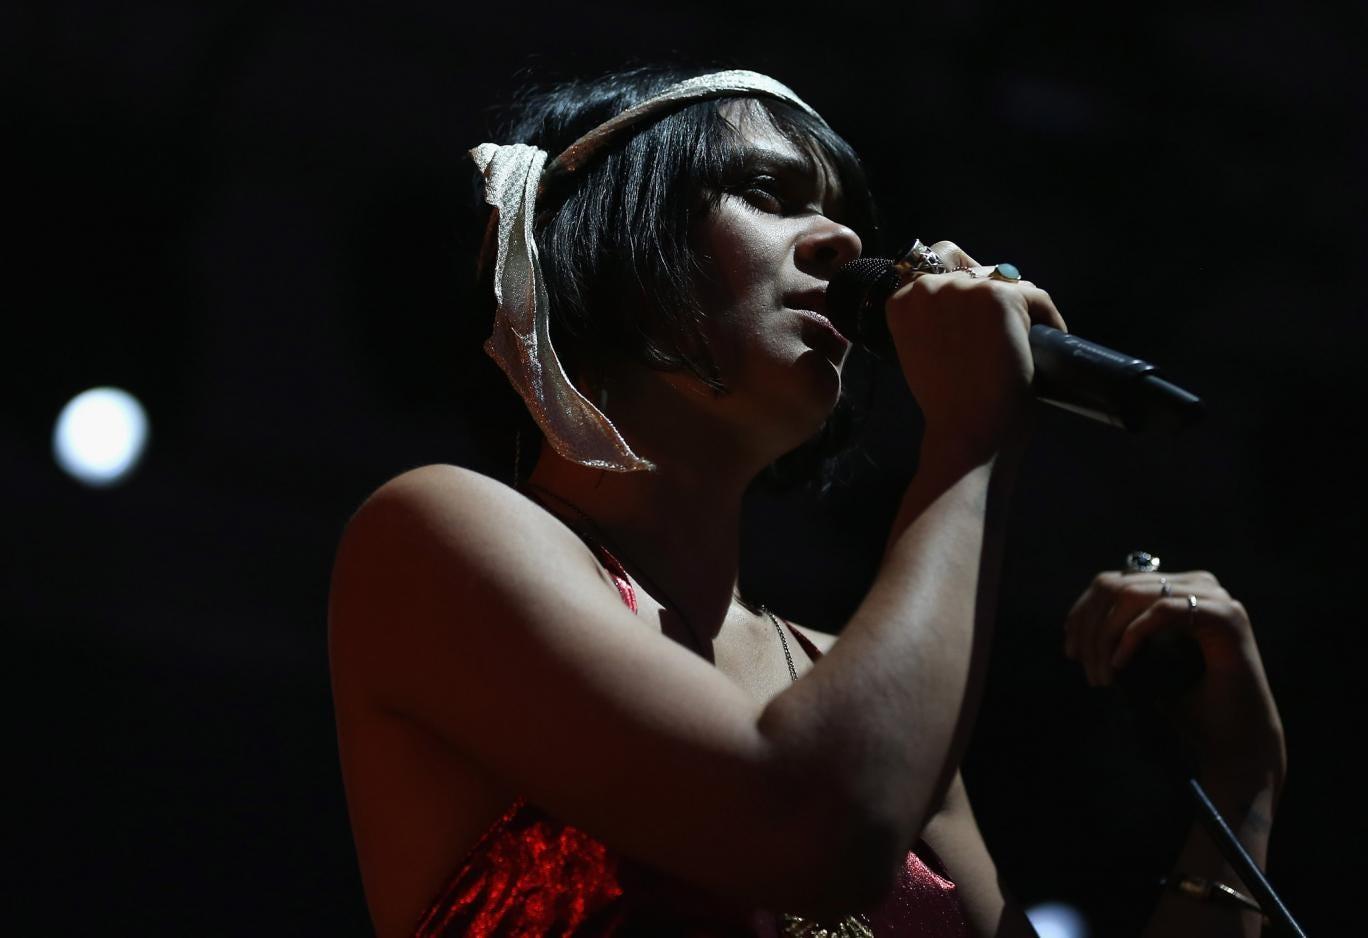 Bat For Lashes' Natasha Khan performing live